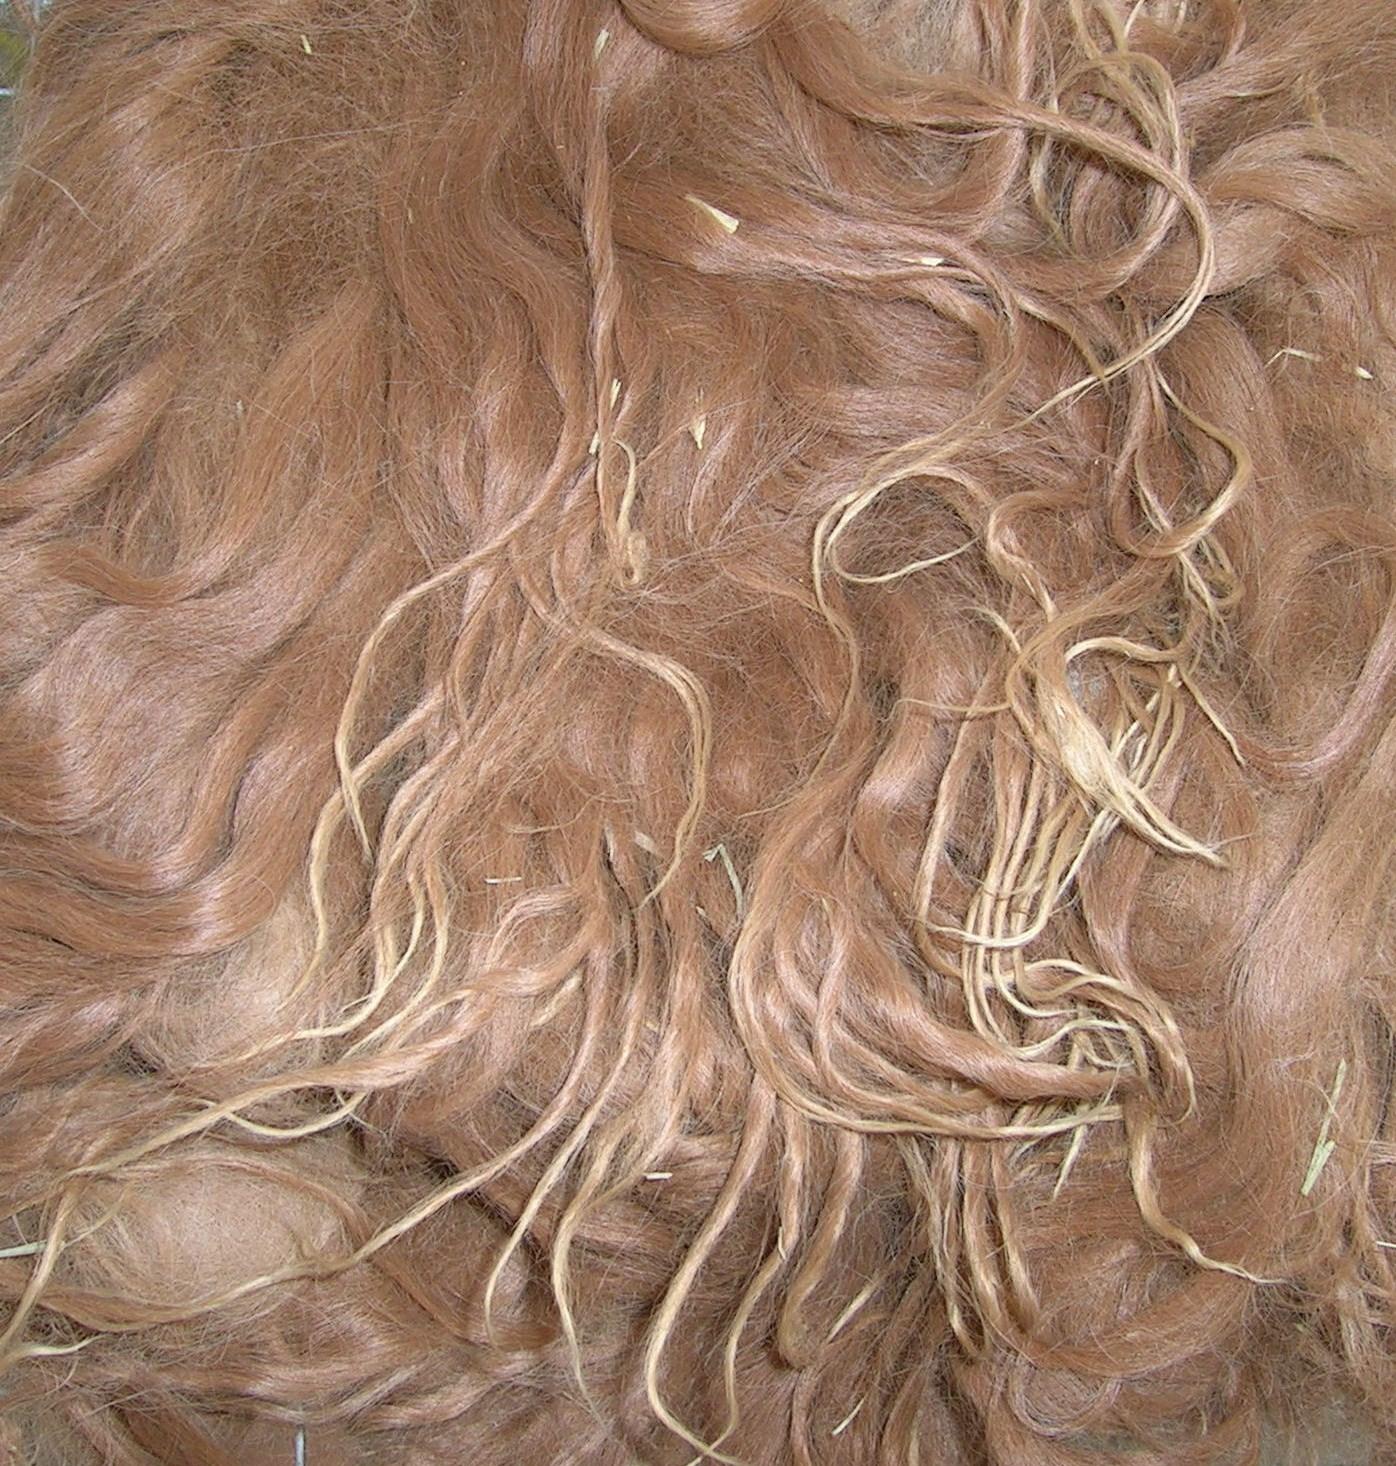 Texas Fiber Mill Processes First Suri Alpaca Fiber